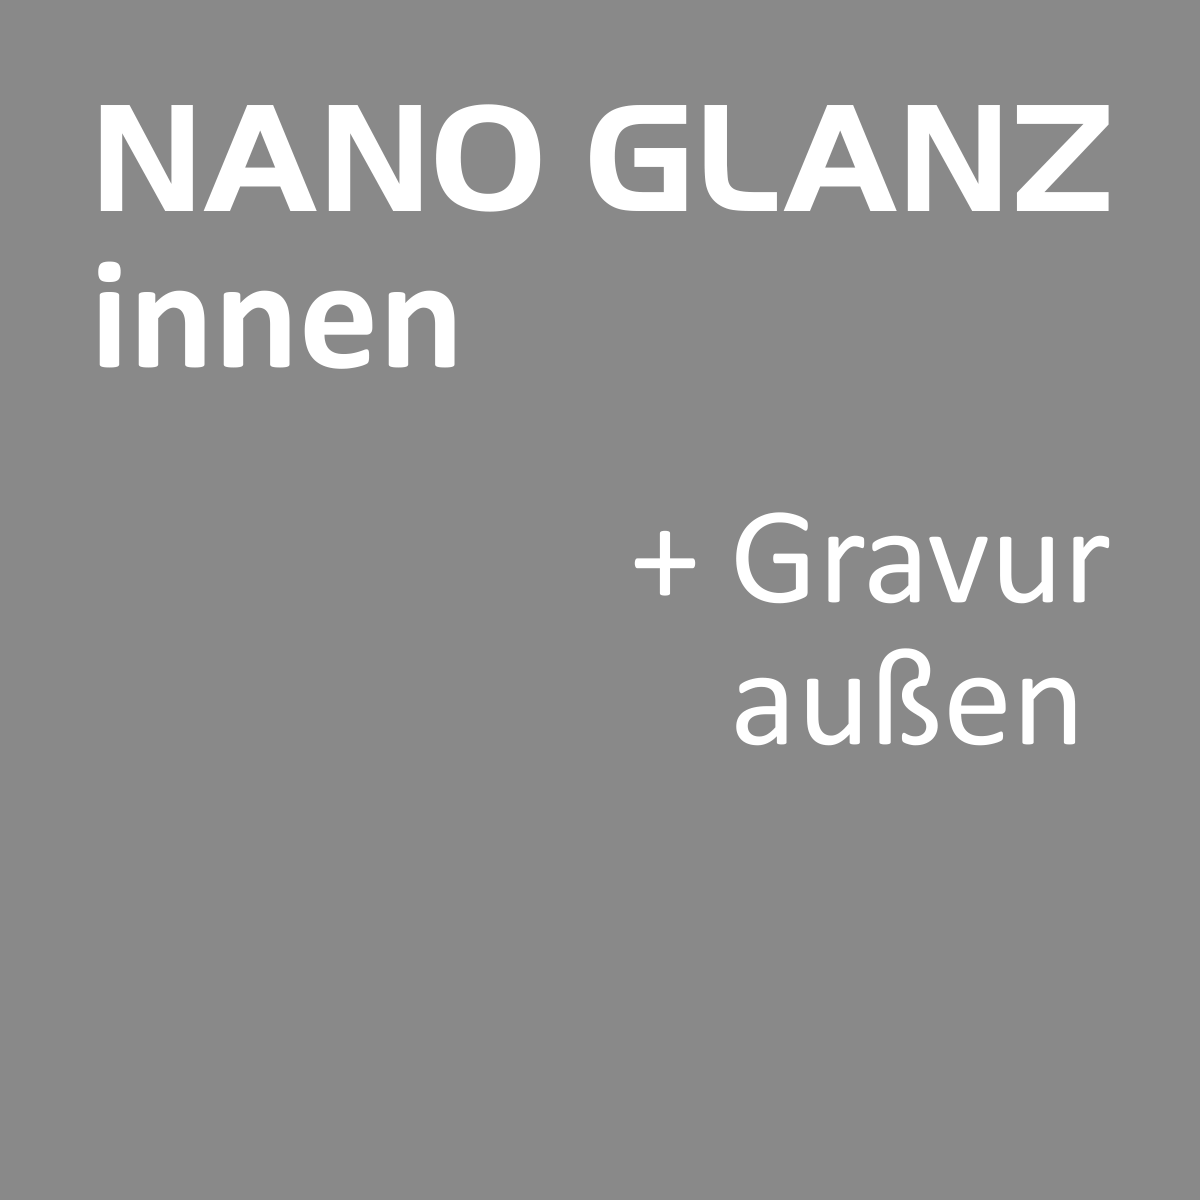 Nano Glanz_6 Text